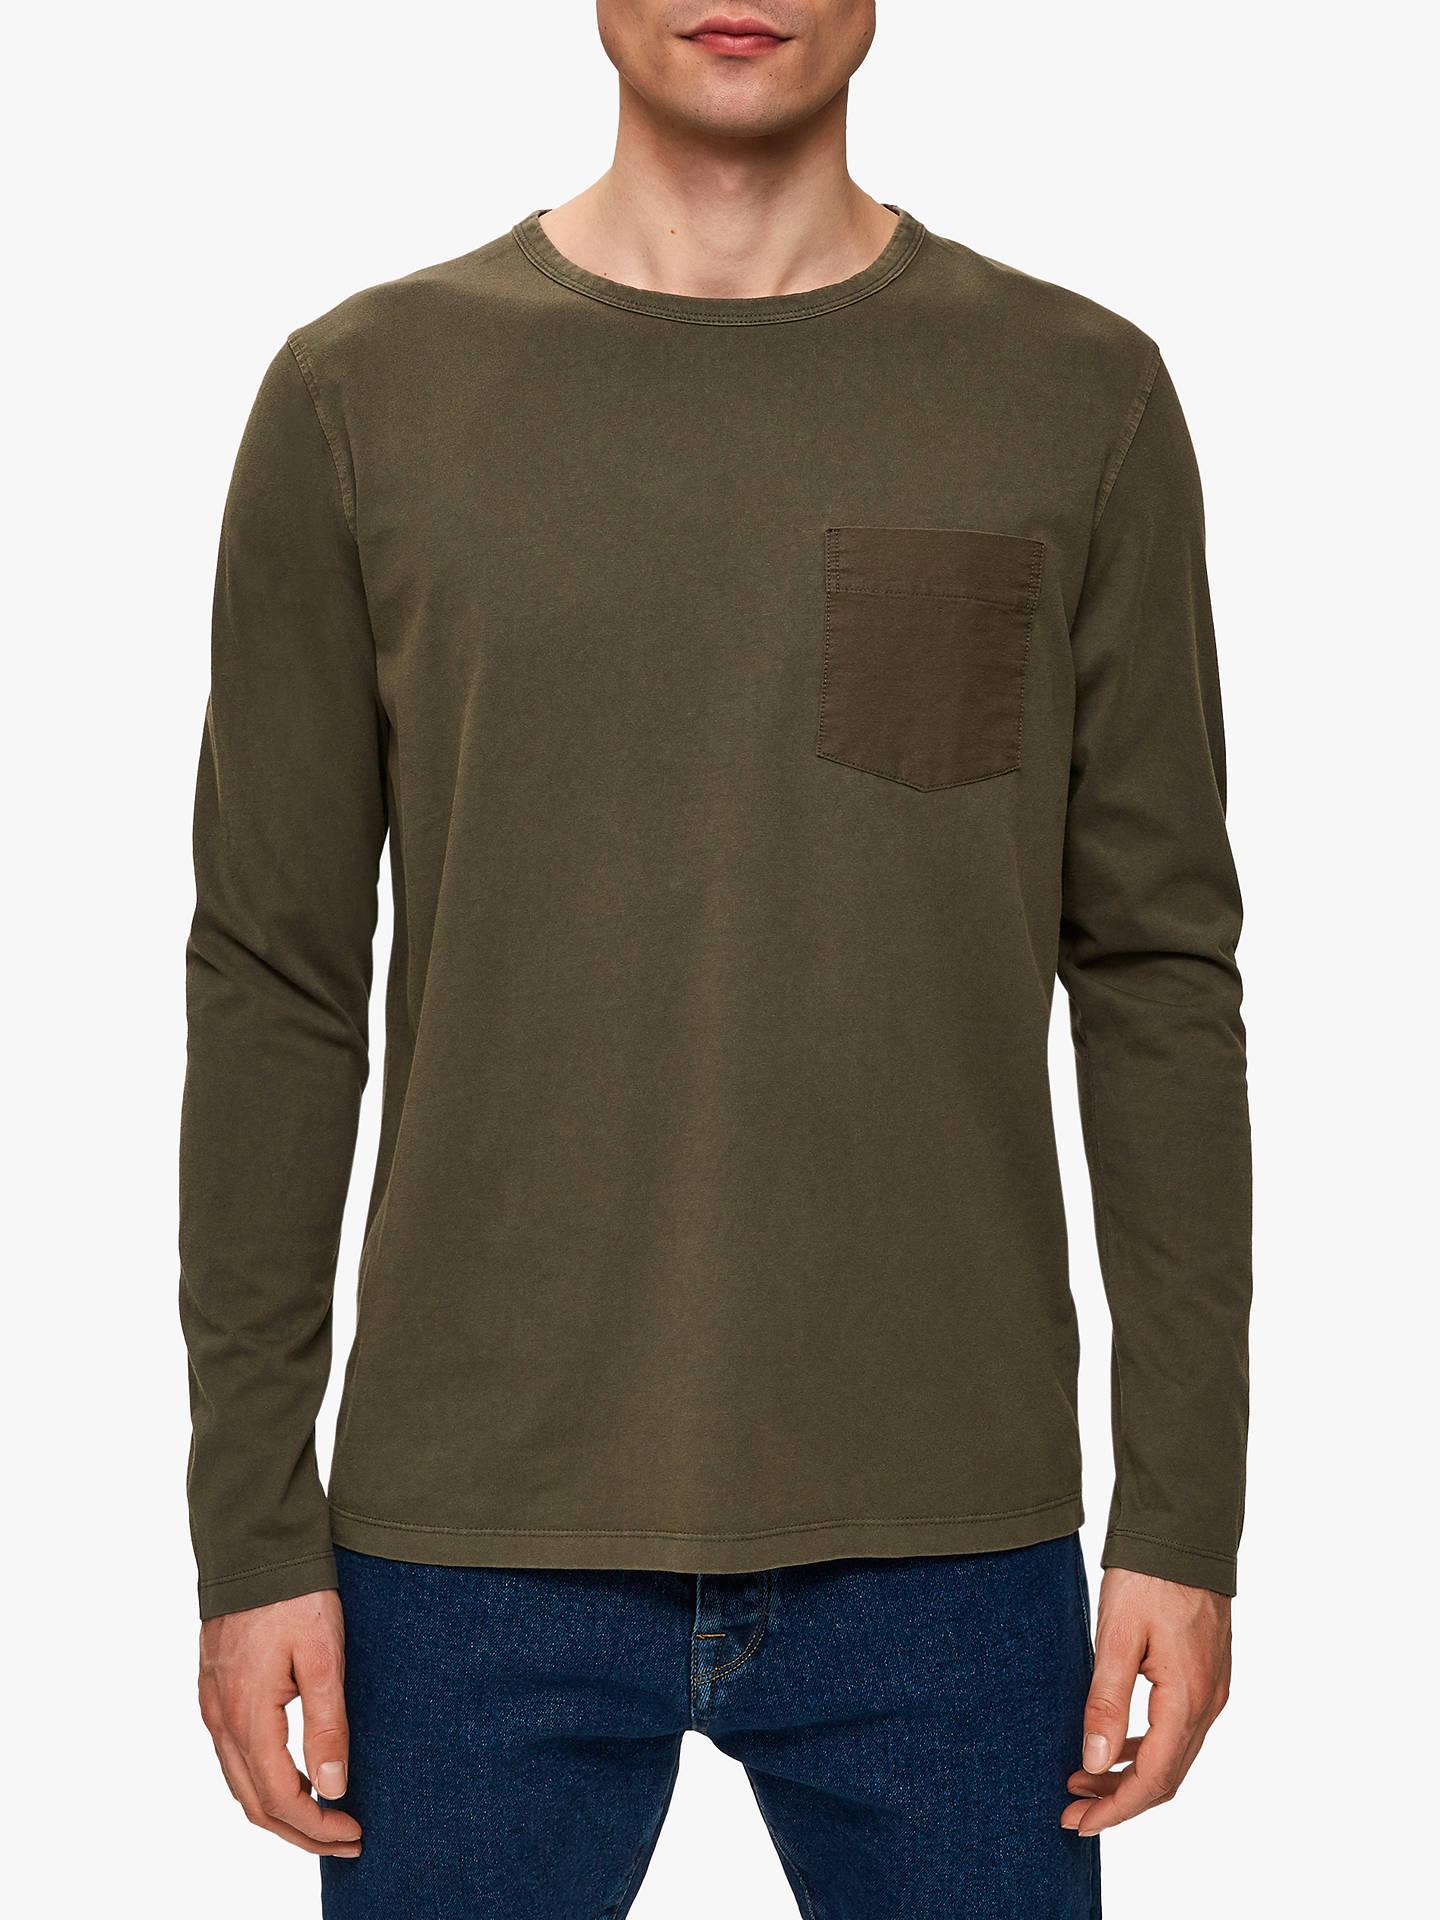 Newborn Kids Love Sea Turtles Printed Long Sleeve 100/% Cotton Infants T-Shirts